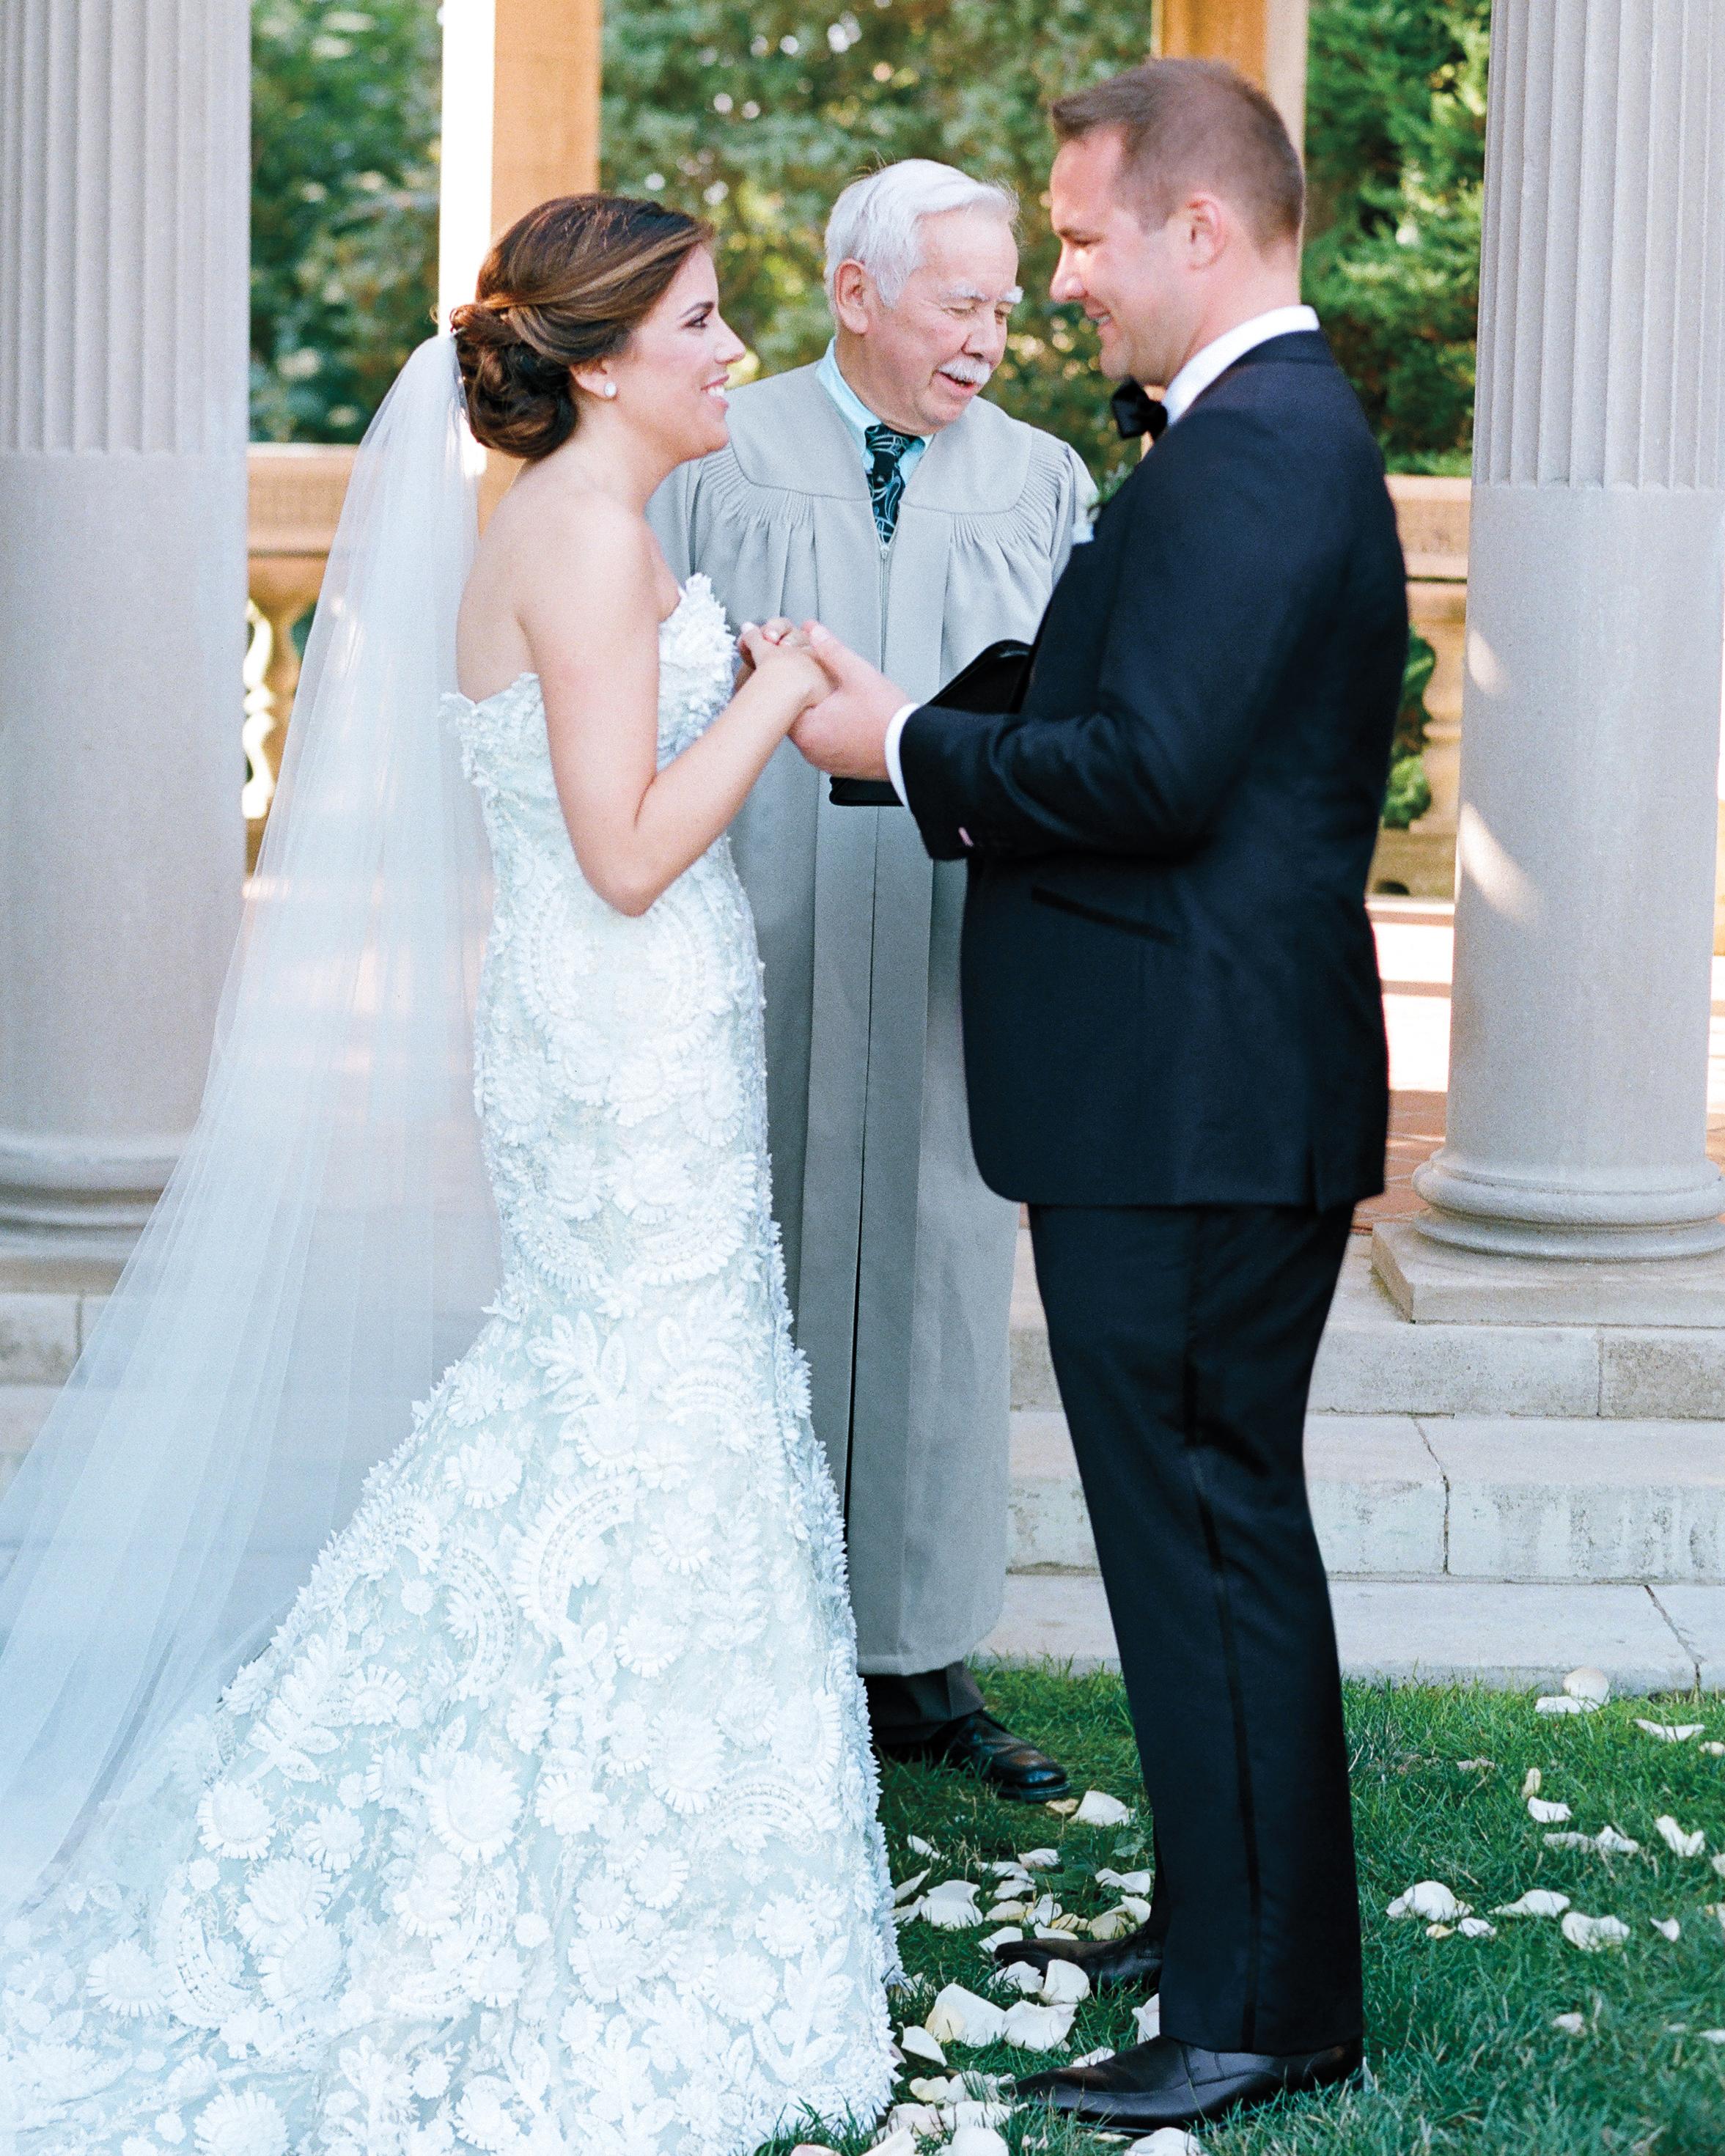 Red, Ruffled, High-Neck Wedding Dress